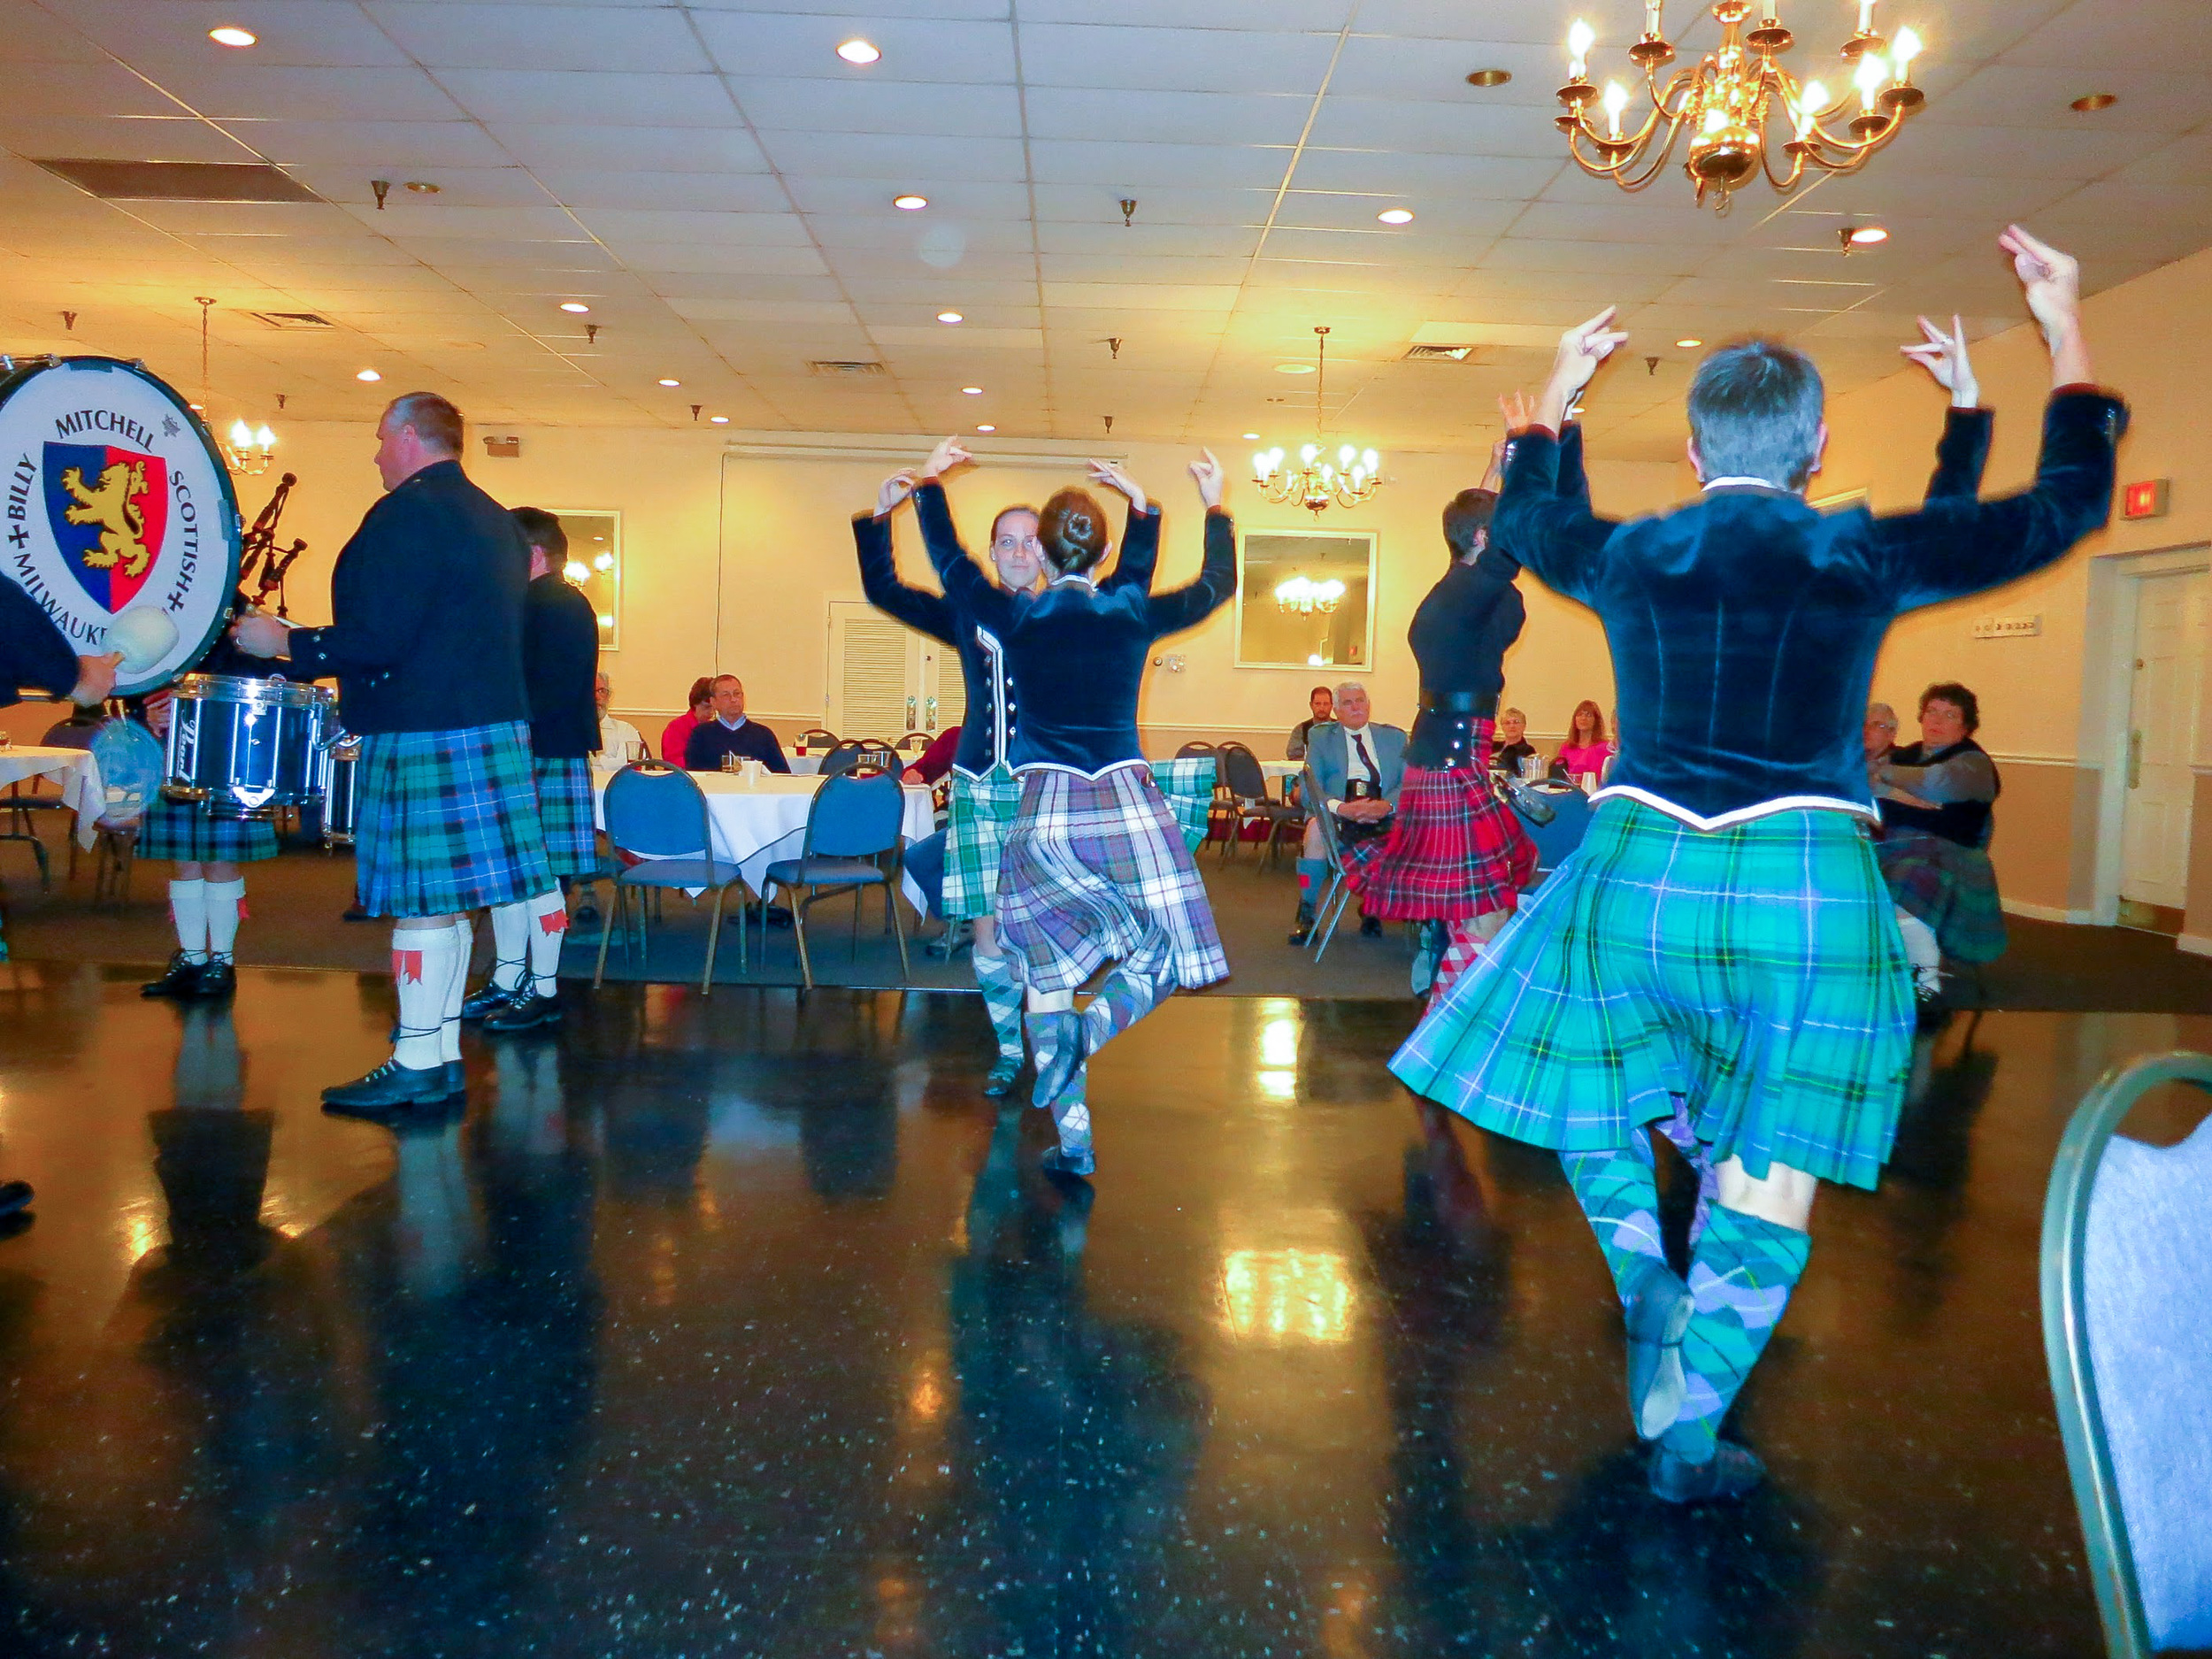 2014-Fall-Highland-Gathering (22 of 26).jpg